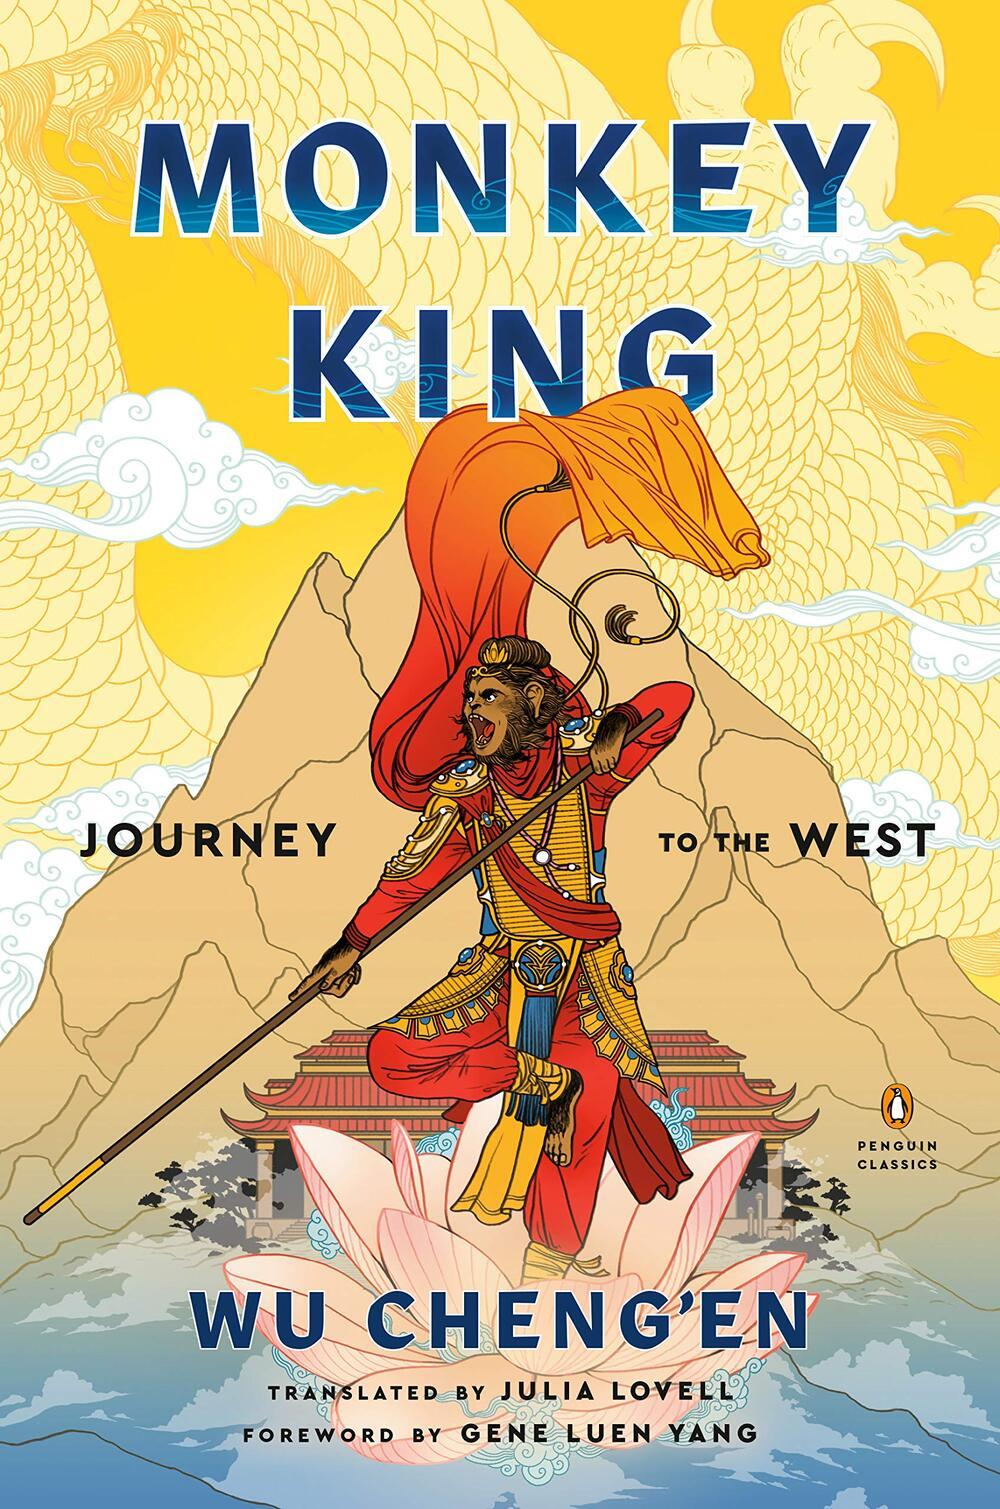 Monkey King: Journey to the West, Wu Cheng'en, Julia Lovell (trans) (Penguin, February 2020)